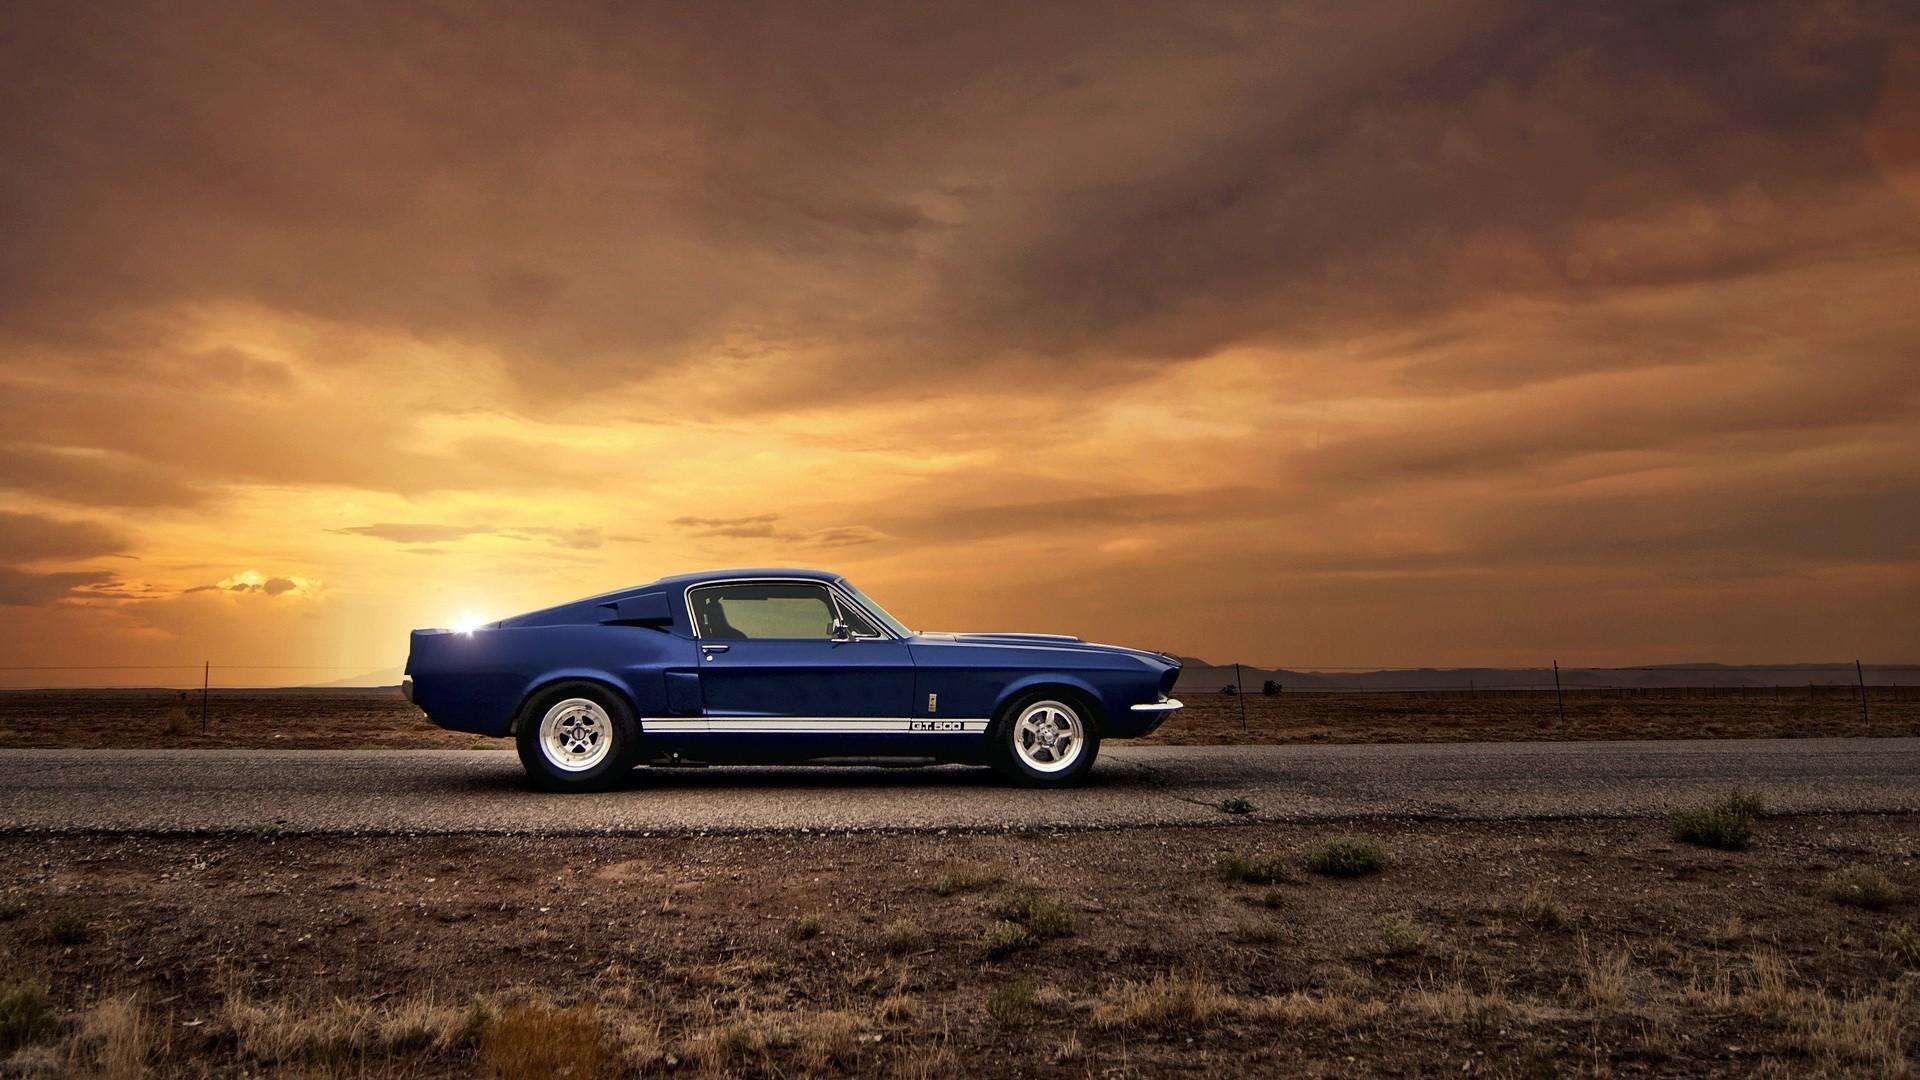 Classic Muscle Car Wallpaper Wallpapertag